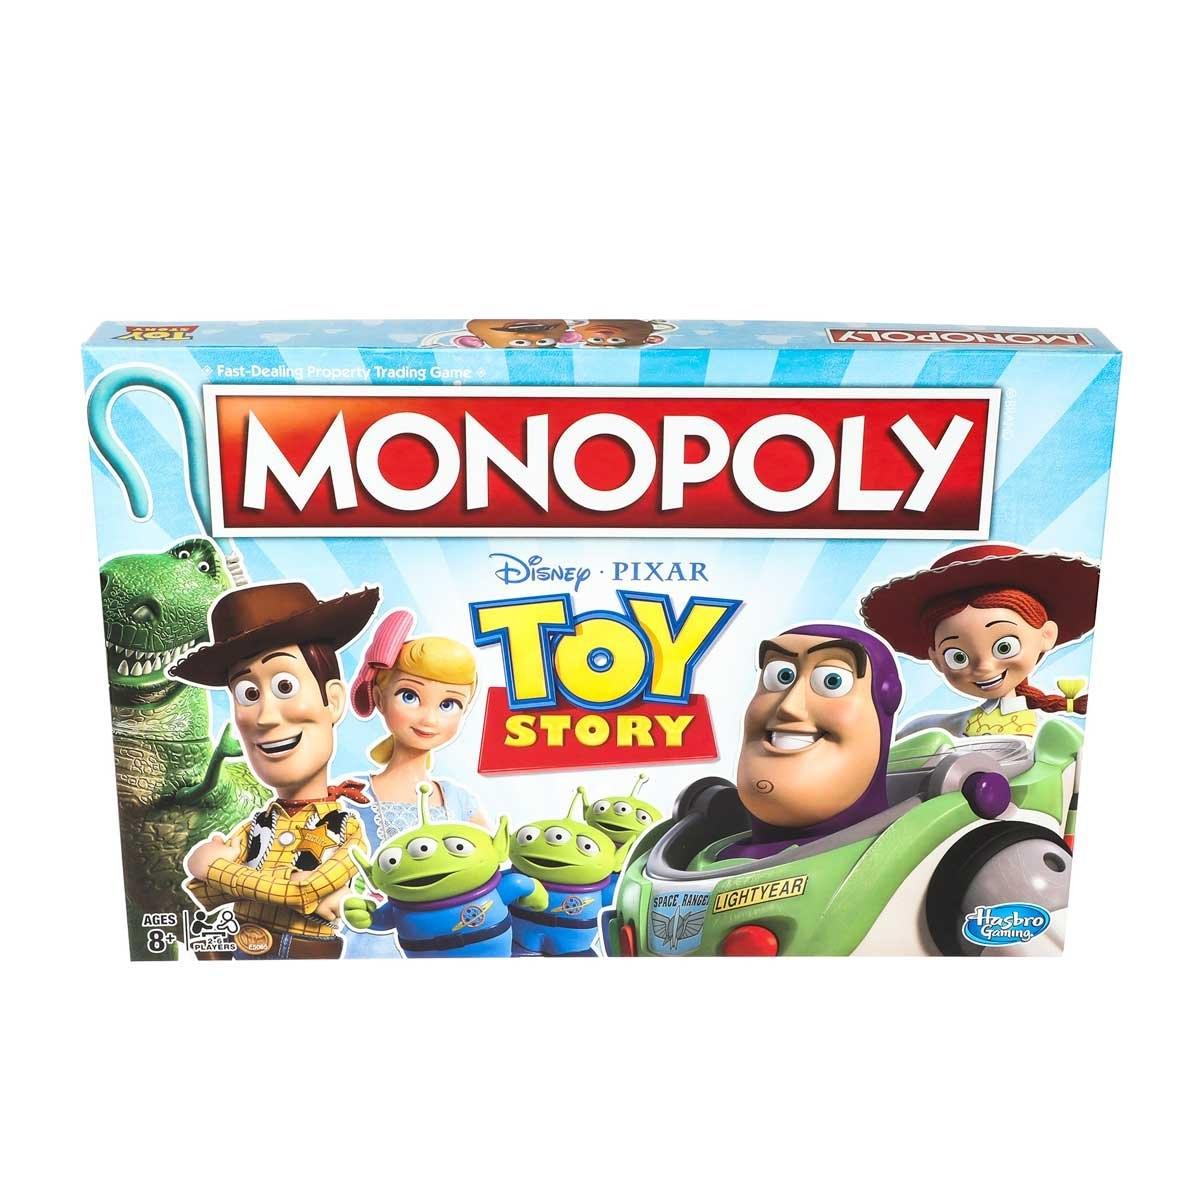 Monopoly Toy Story 4 Hasbro